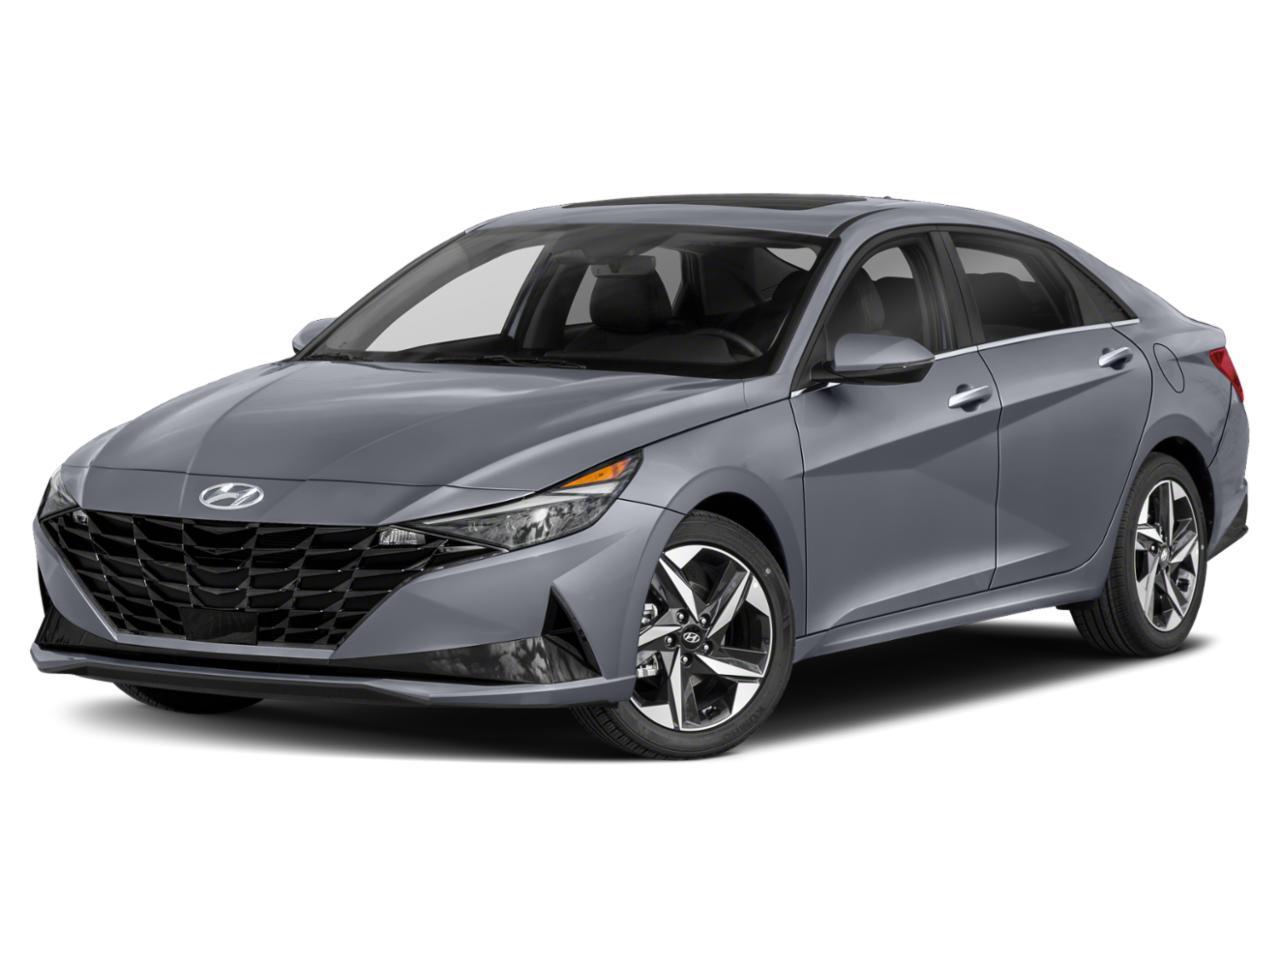 2022 Hyundai Elantra Groveport OH